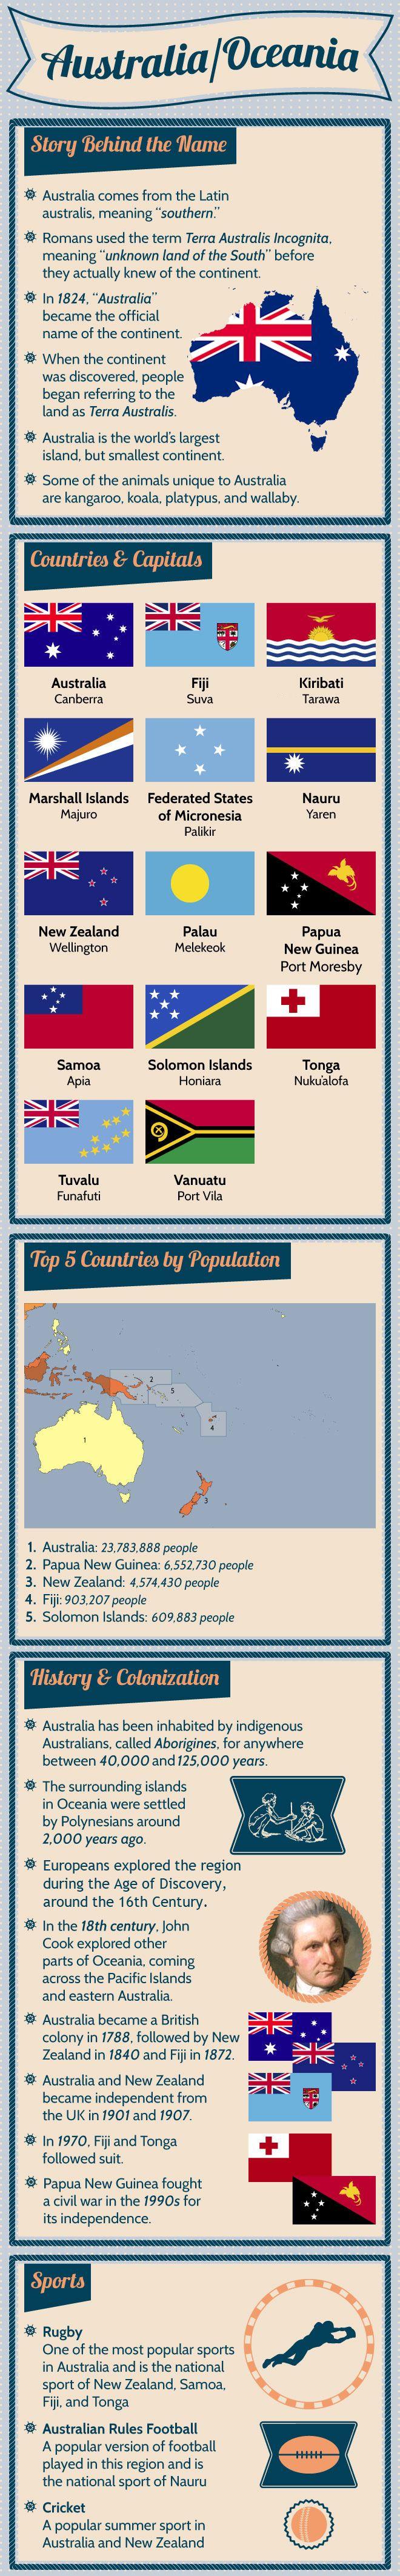 Infographic of Australia Oceania Facts